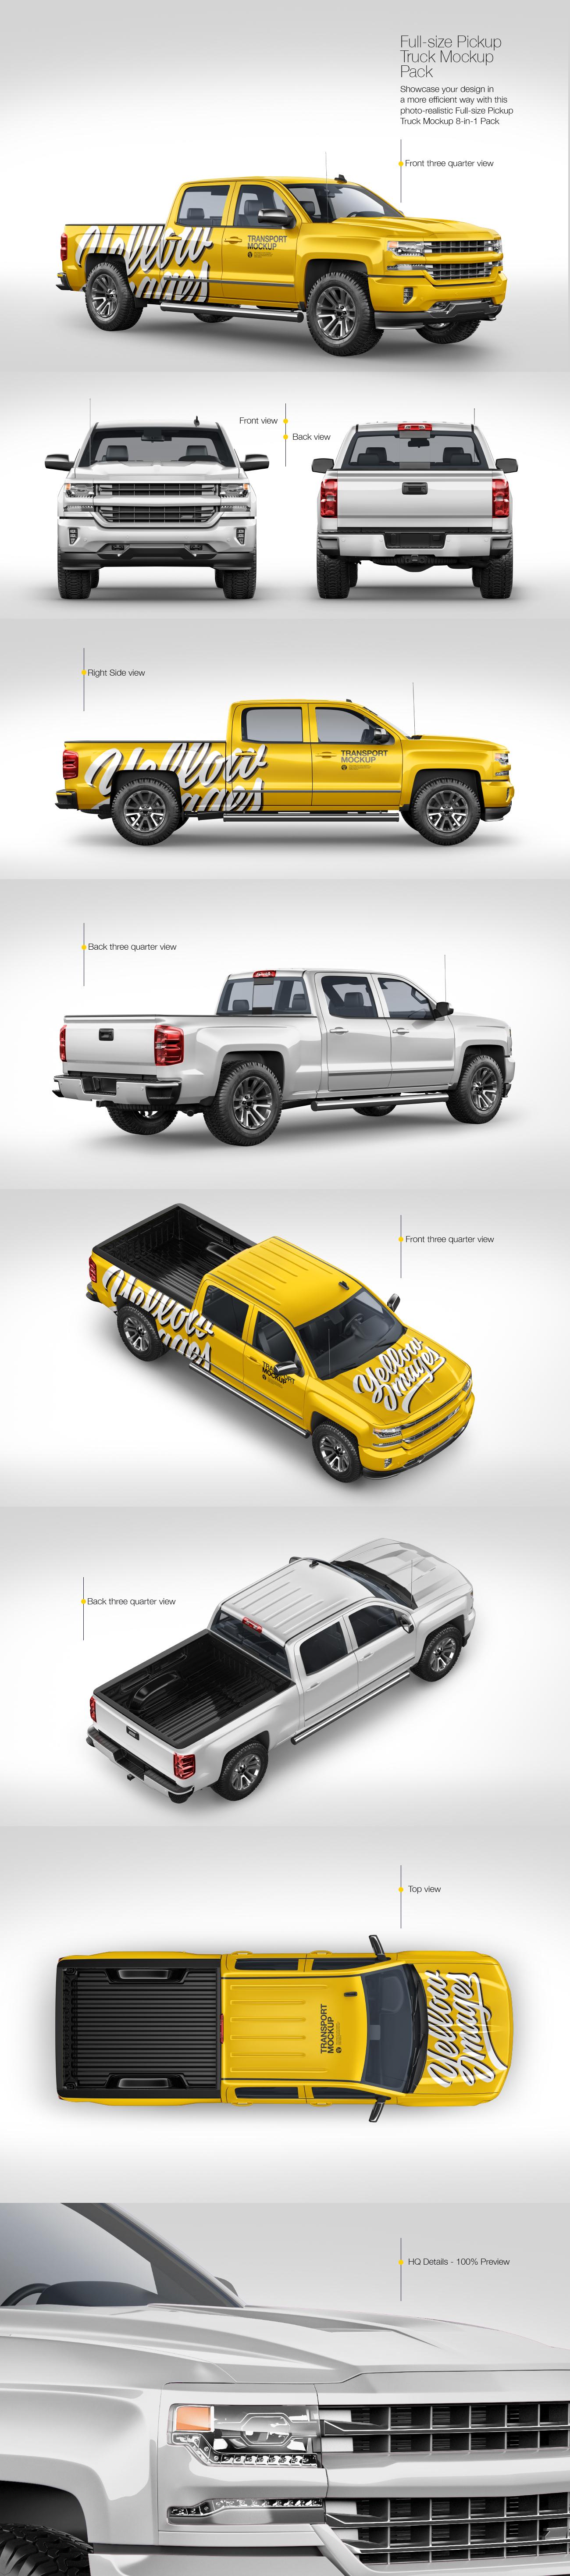 Full-Size Pickup Truck Mockup Pack